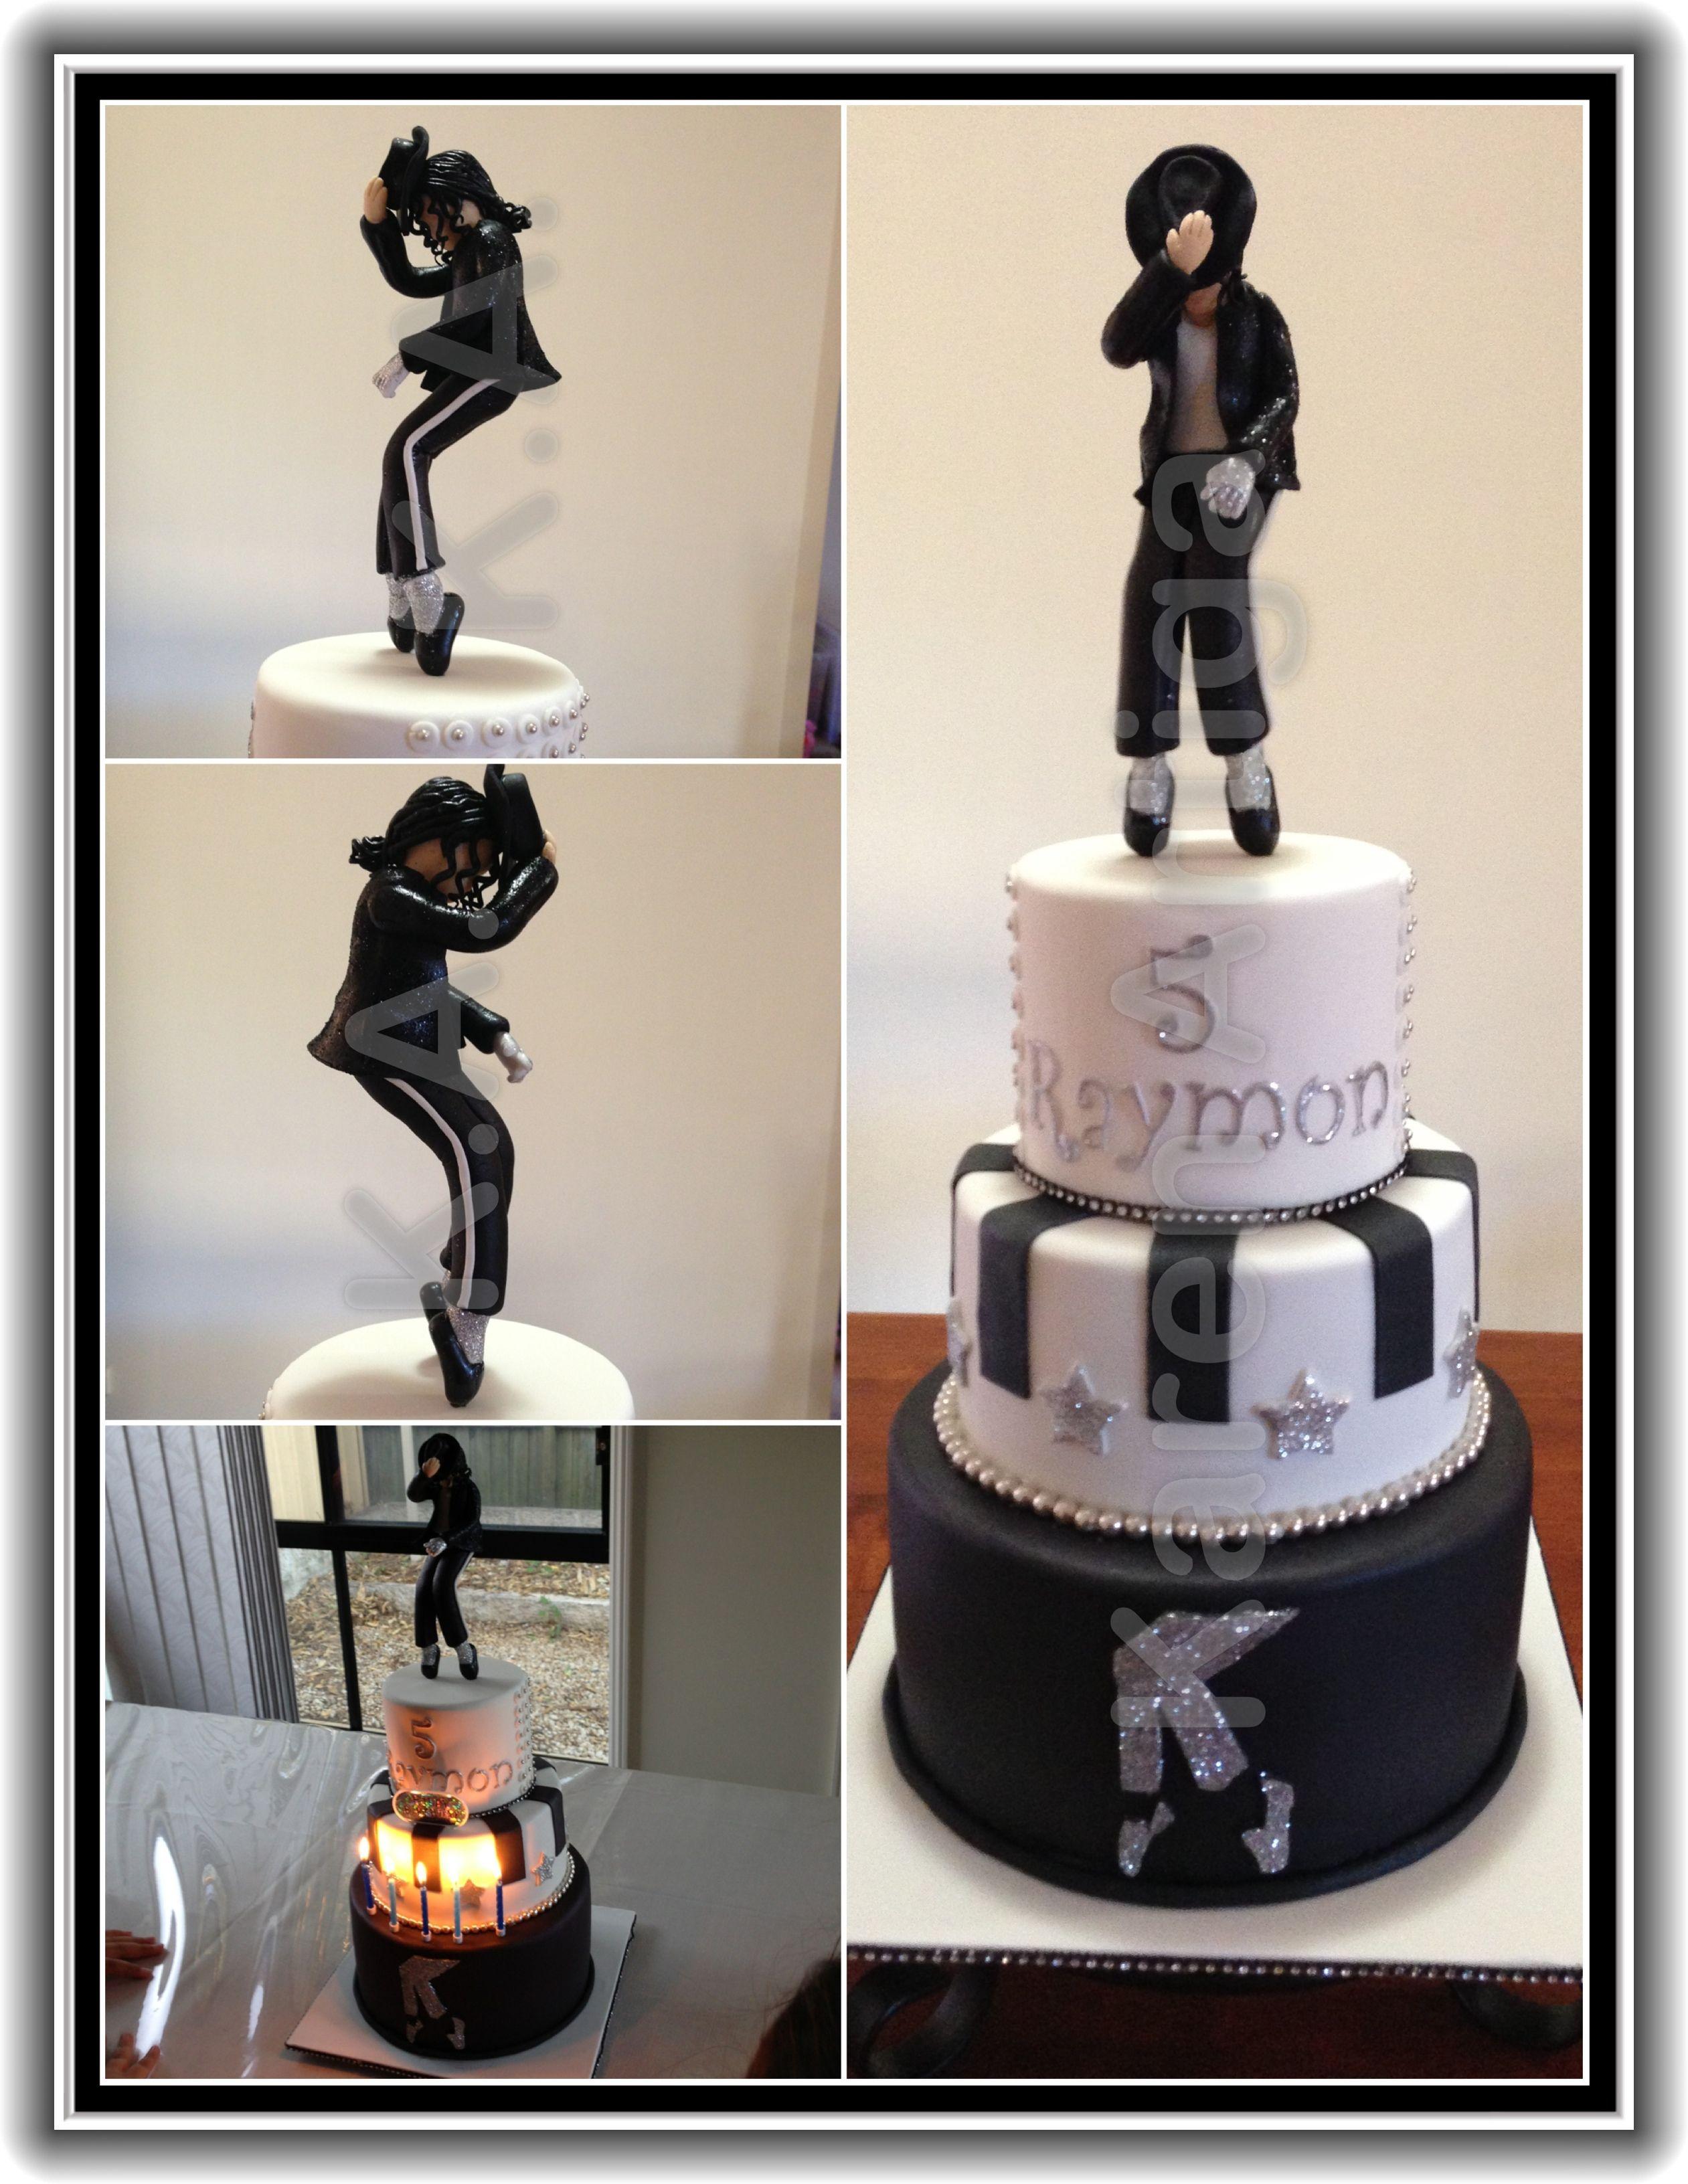 Michael Jackson Birthday Cake For My Little Nephew Raymon MJ Figurine Made Out Of